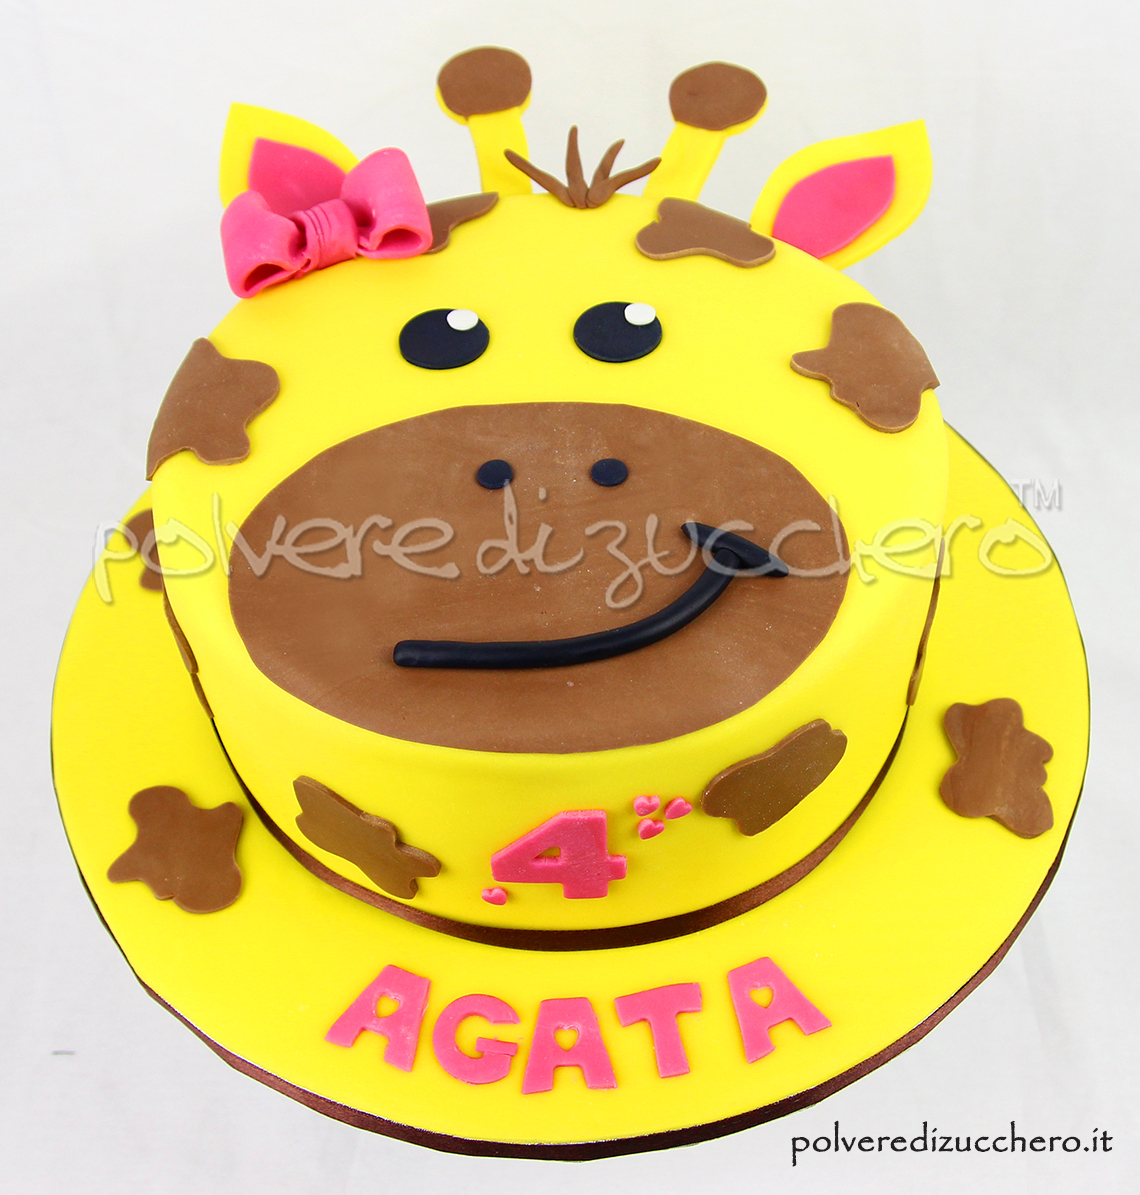 cake design torta decorata pasta di zucchero giraffa giraffe cake polvere di zucchero